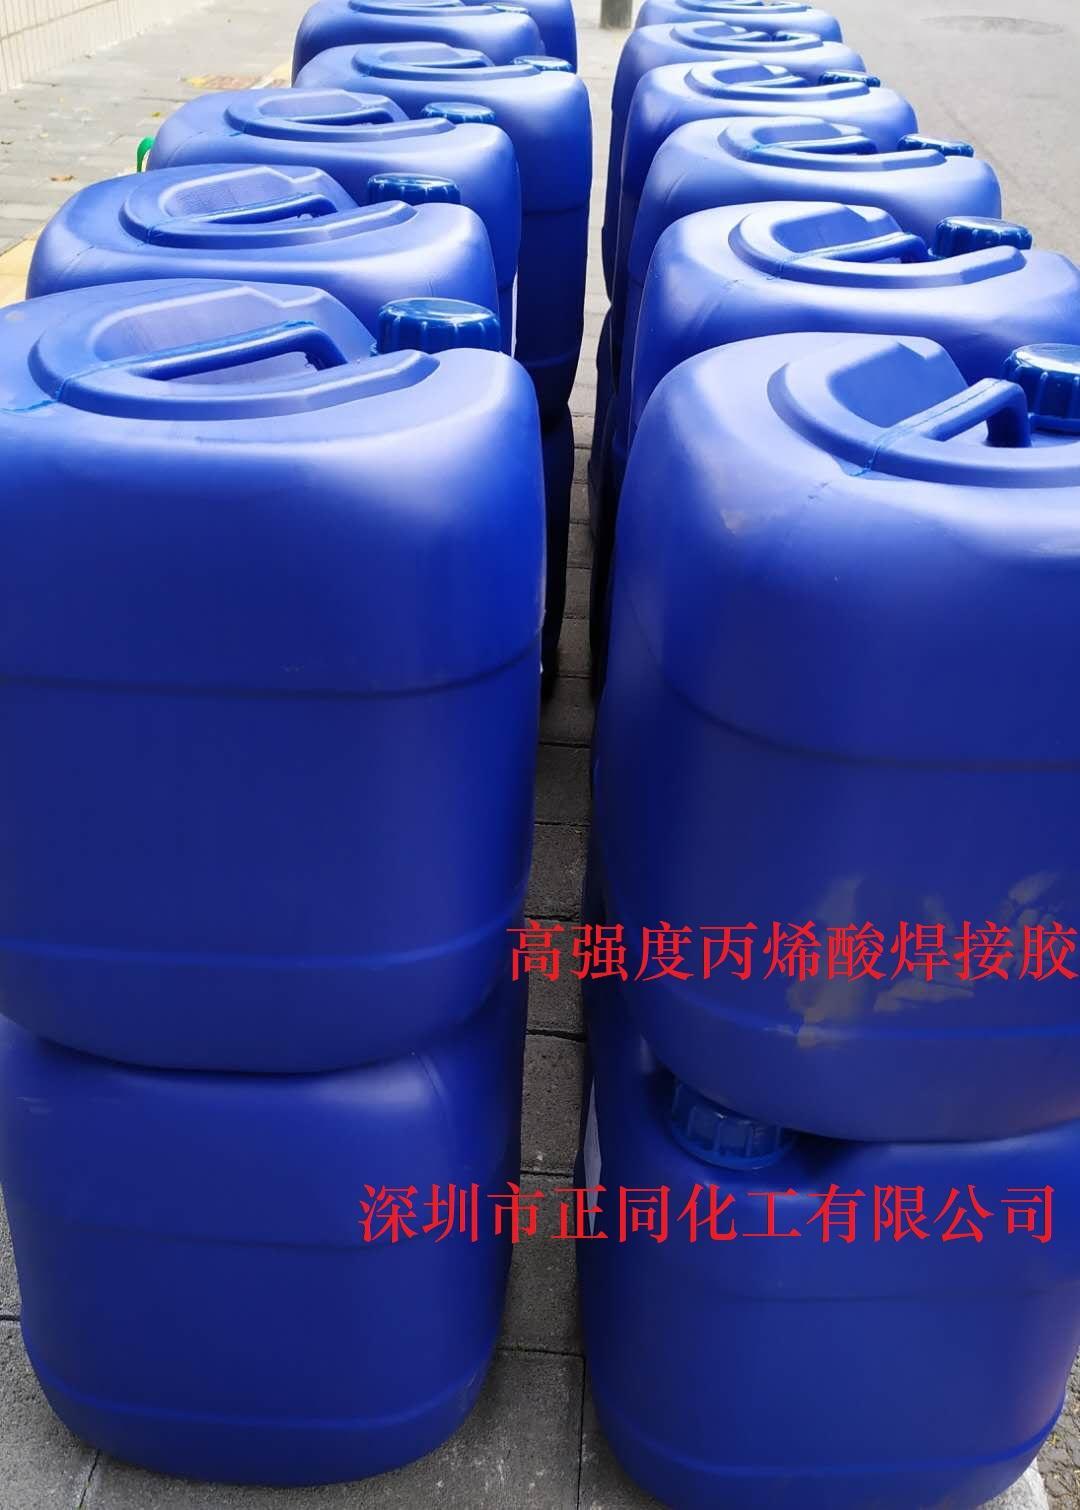 AB-303双组份丙烯酸胶粘剂